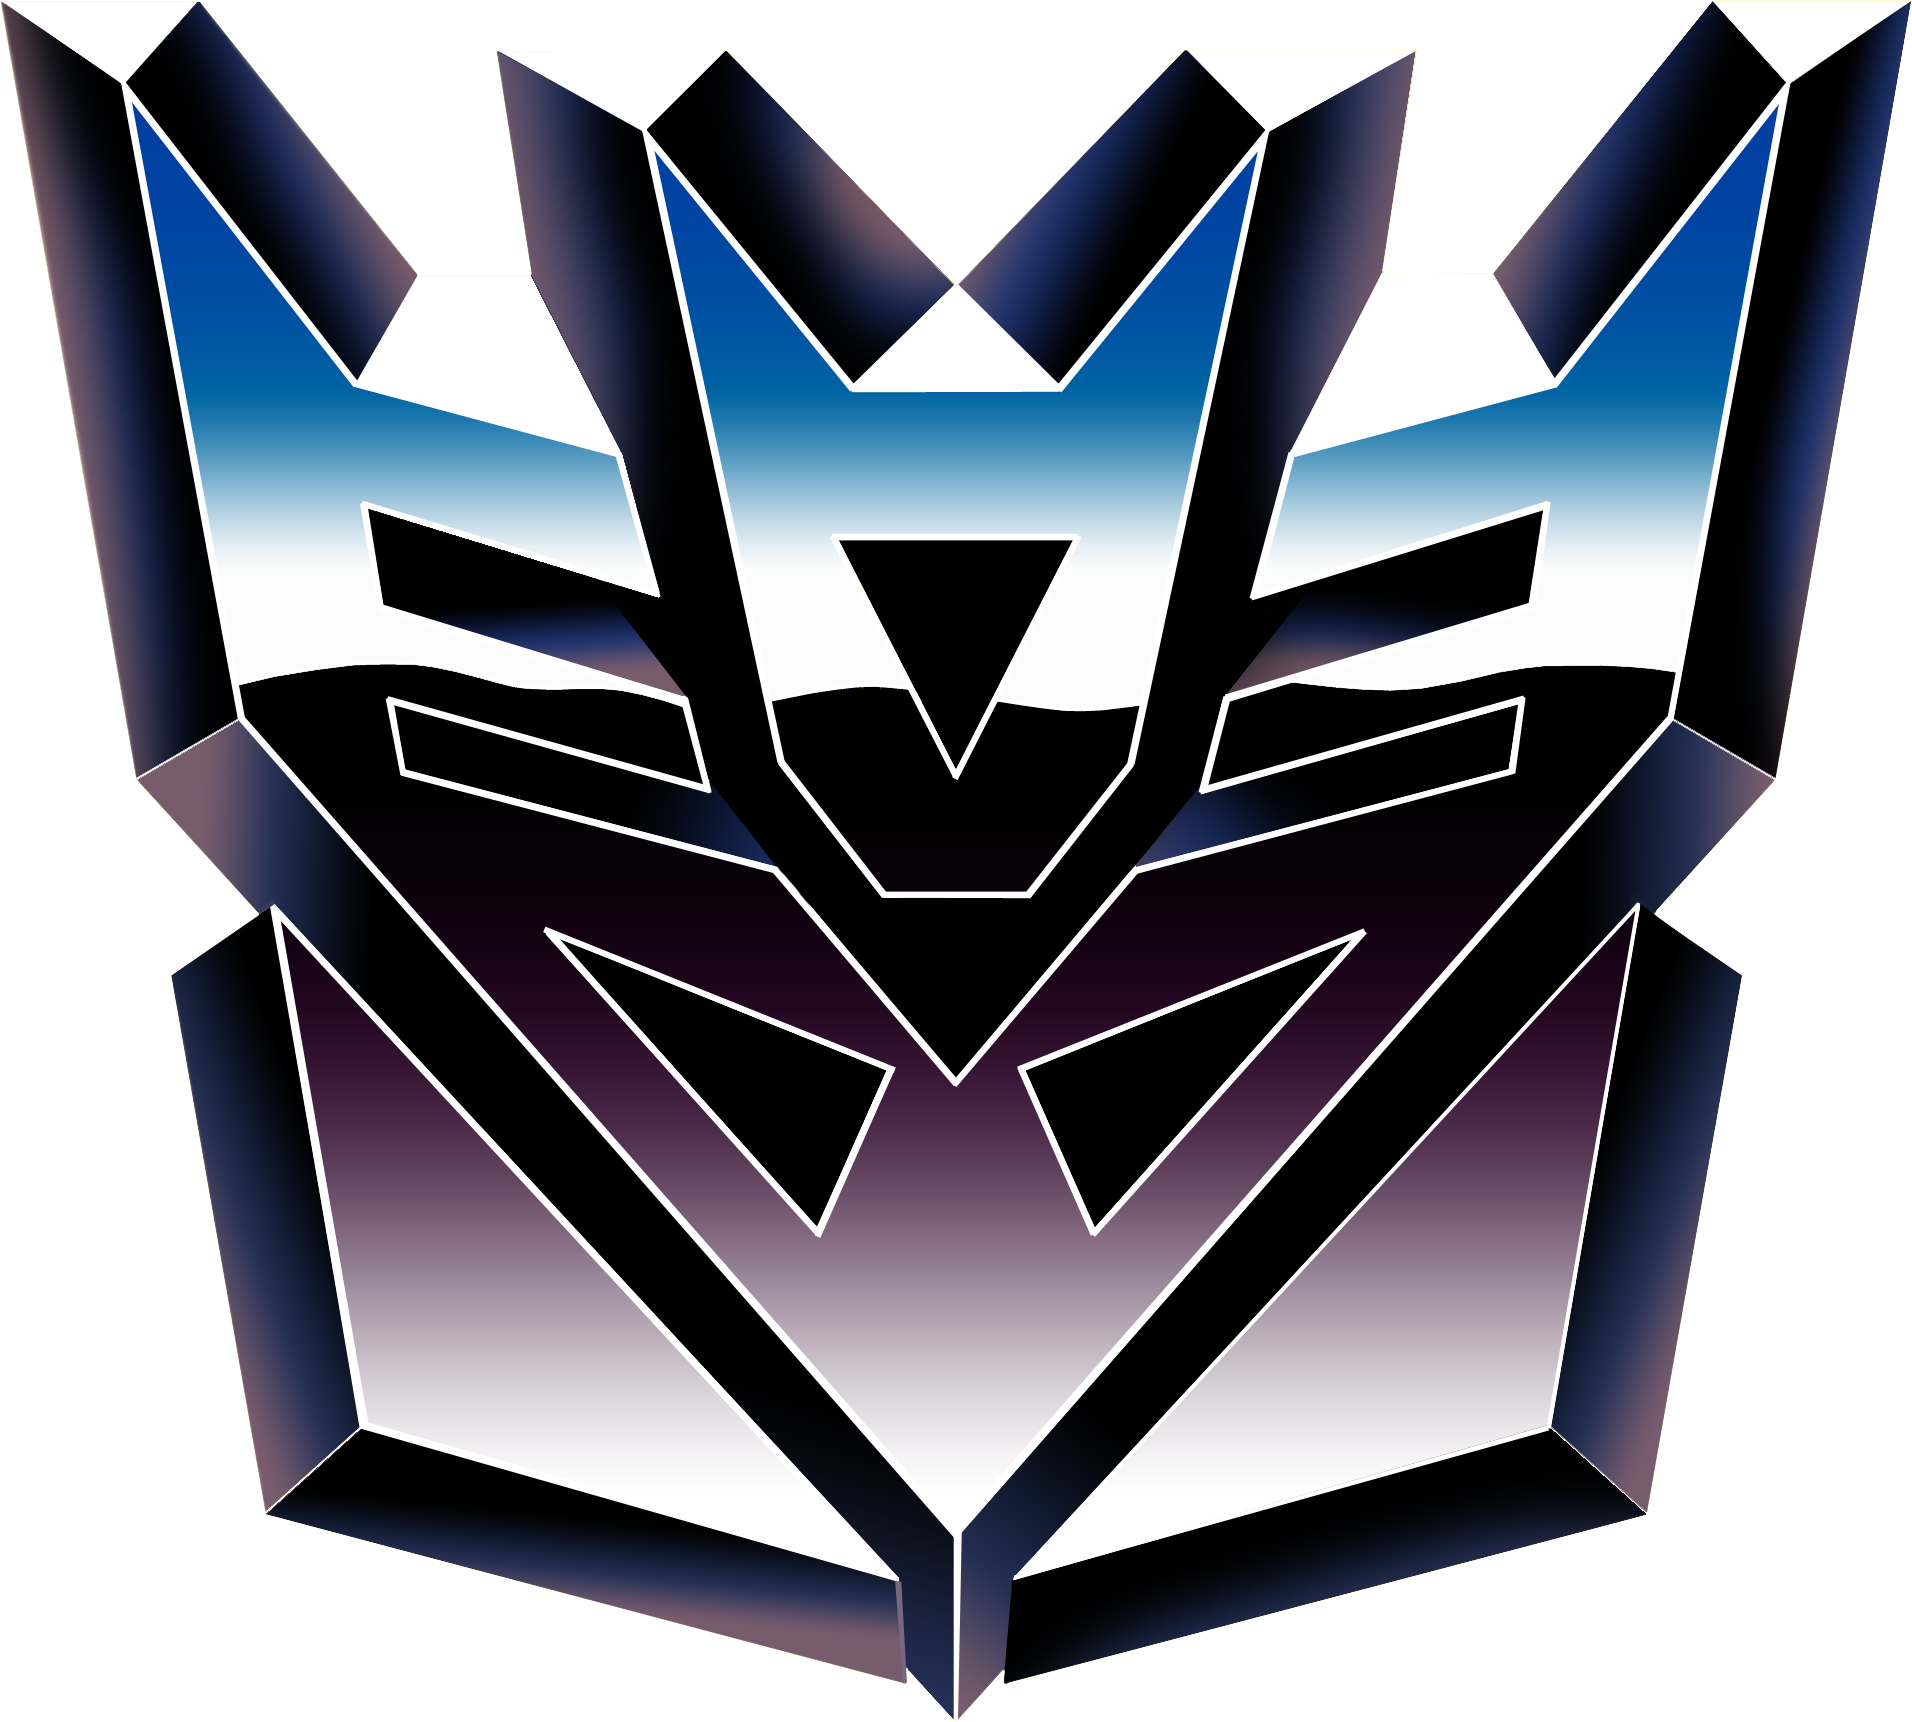 Transformers Logos Transformer Logo Decepticon Logo Decepticons